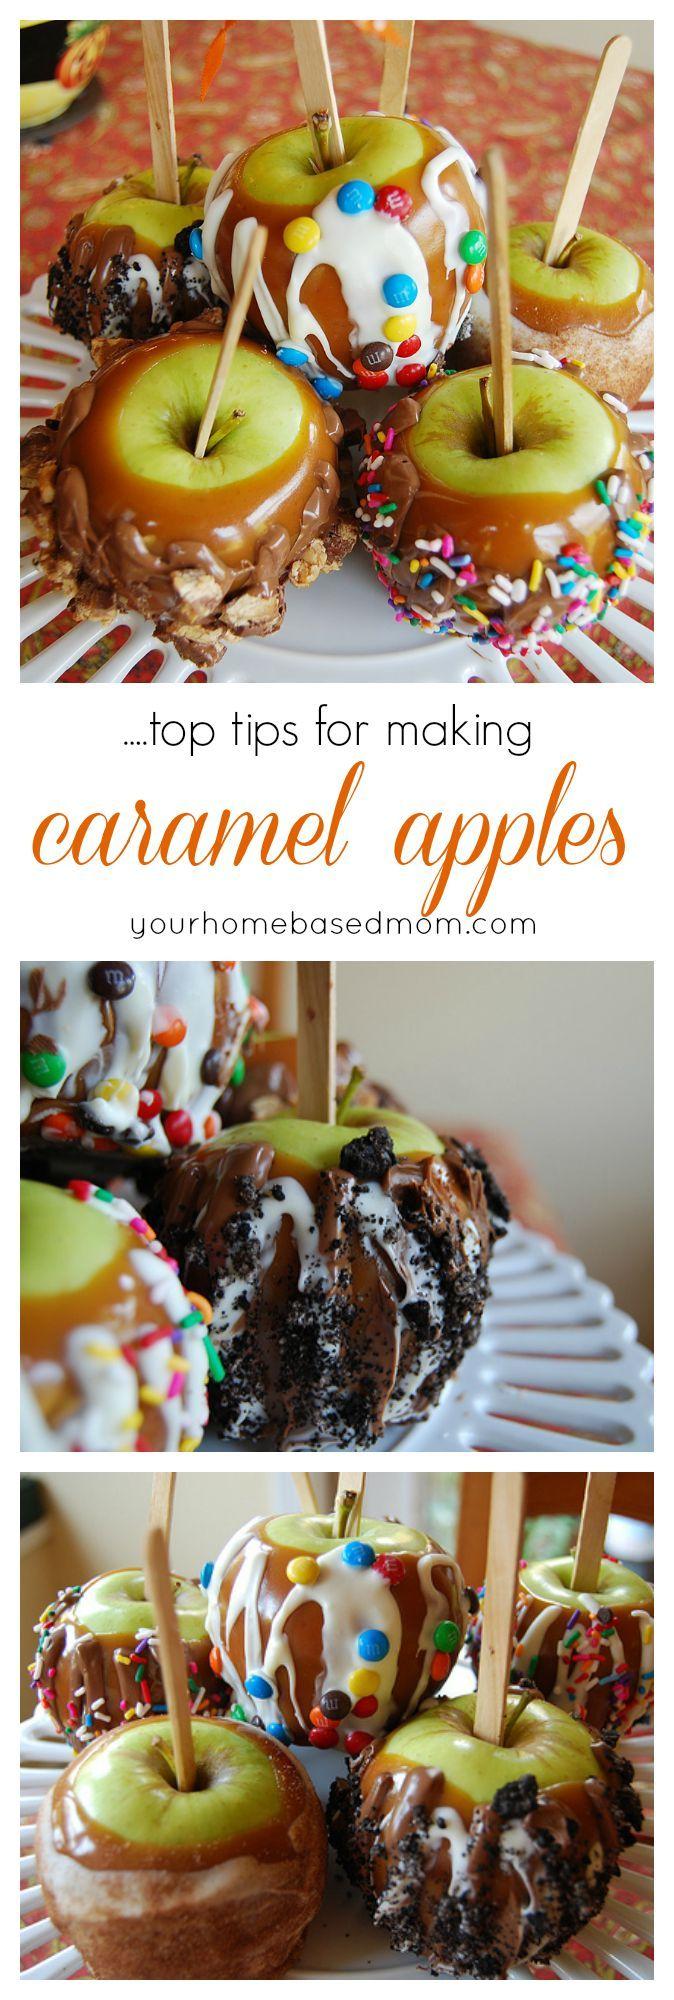 Top Tips for Making Caramel Apples. Fun Fall treat idea.